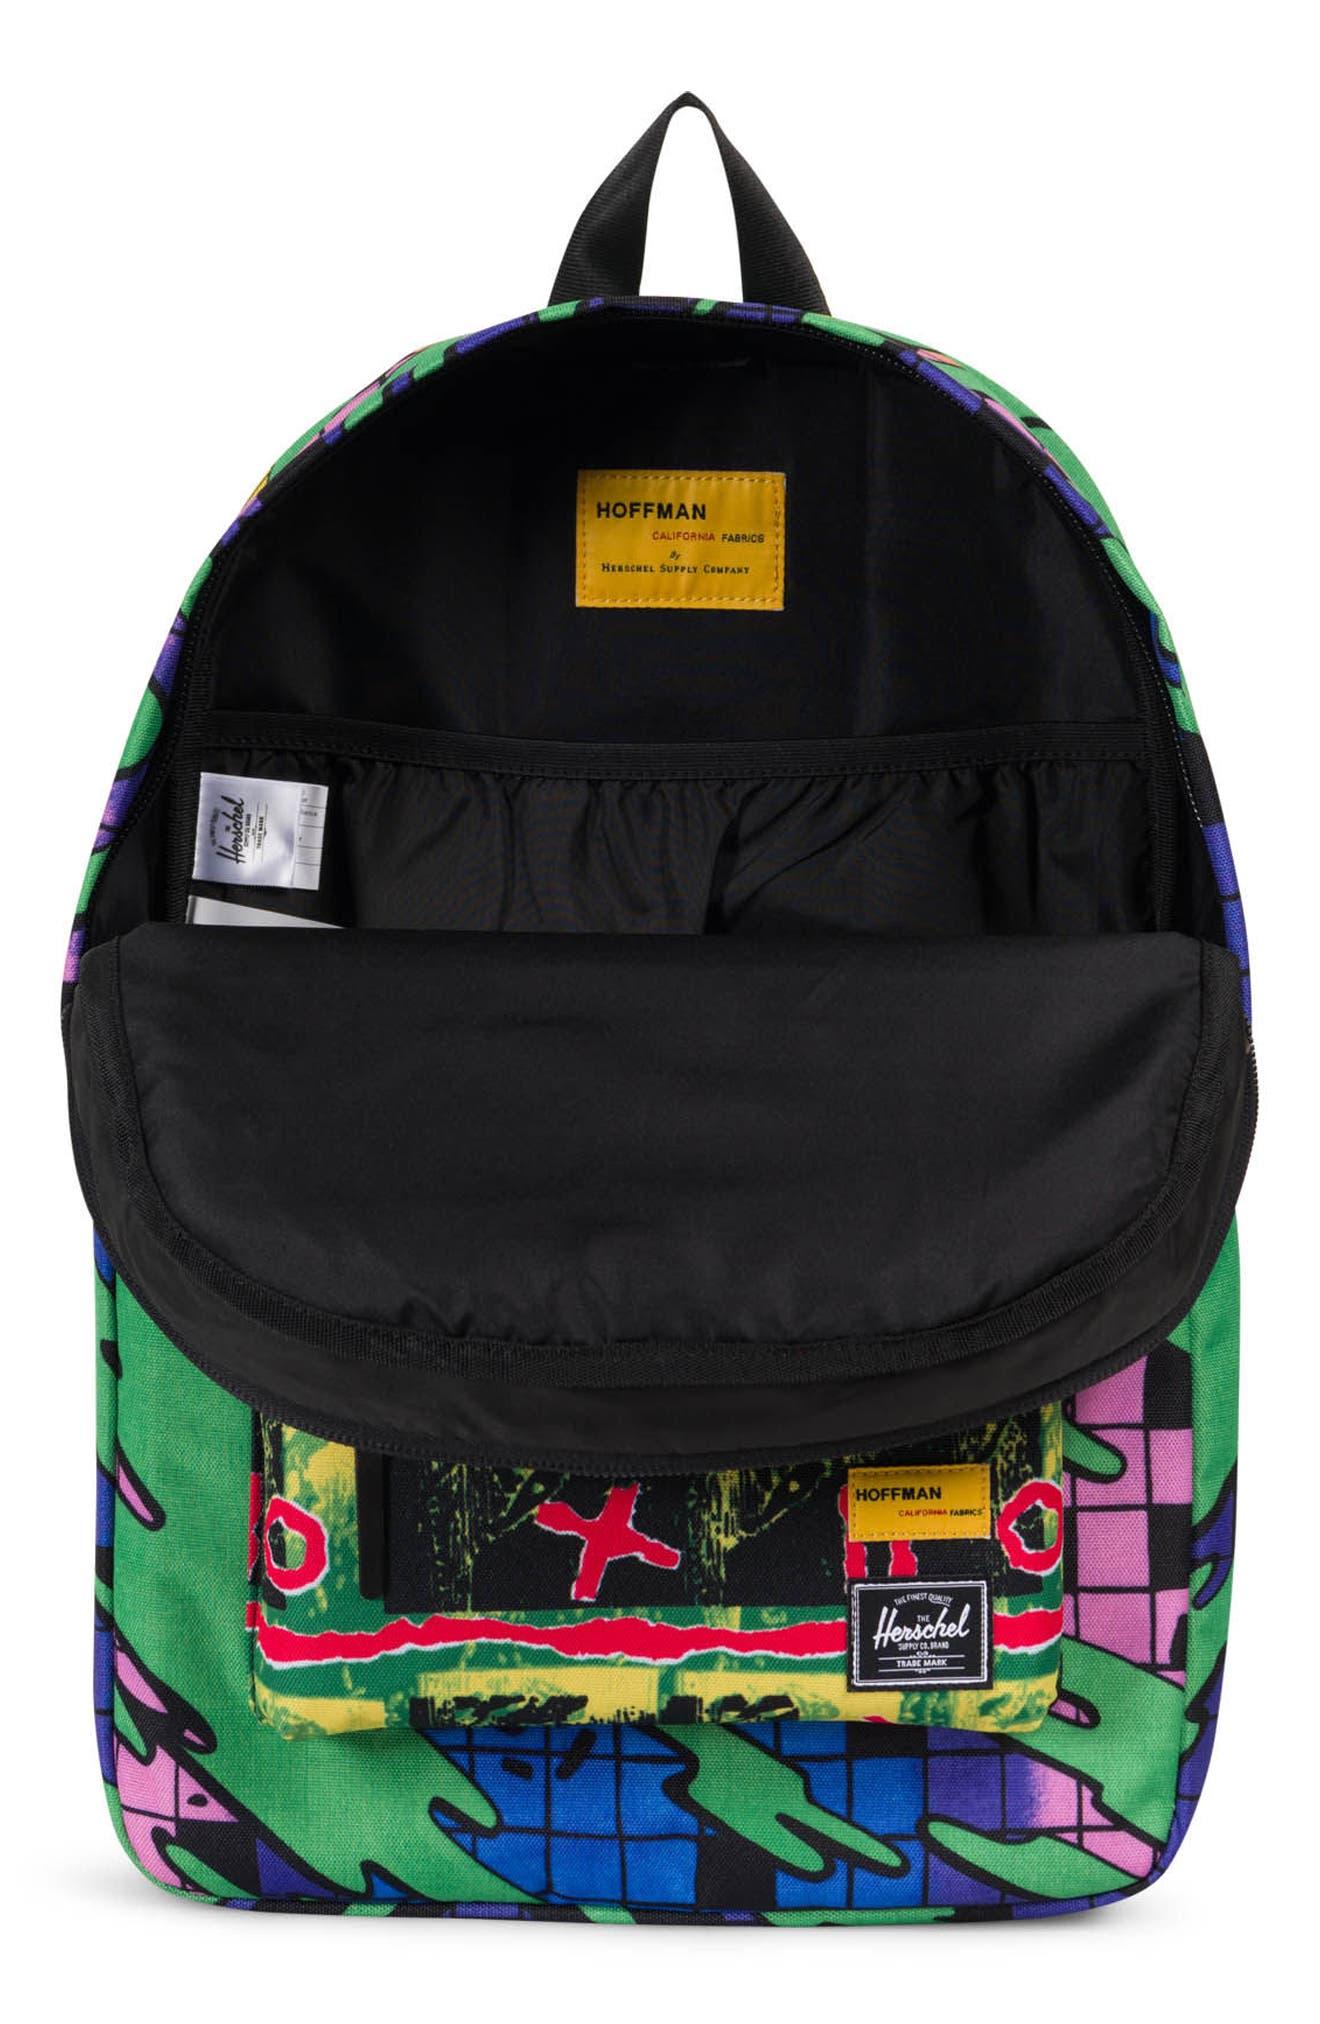 Hoffman Winlaw Backpack,                             Alternate thumbnail 3, color,                             Green